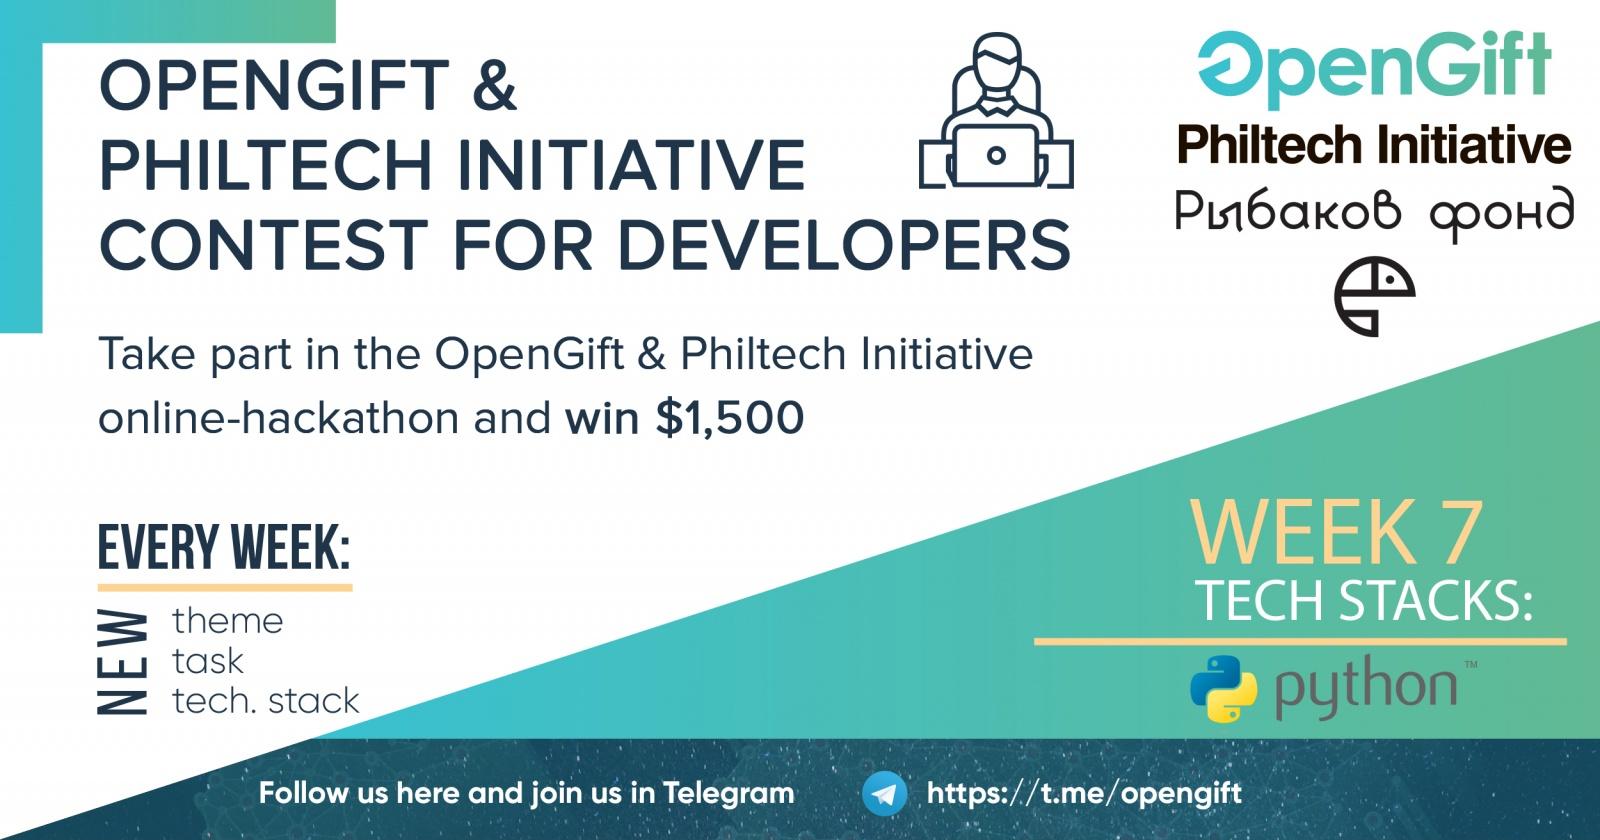 Совместный онлайн-хакатон от OpenGift и Philtech Initiative - 1